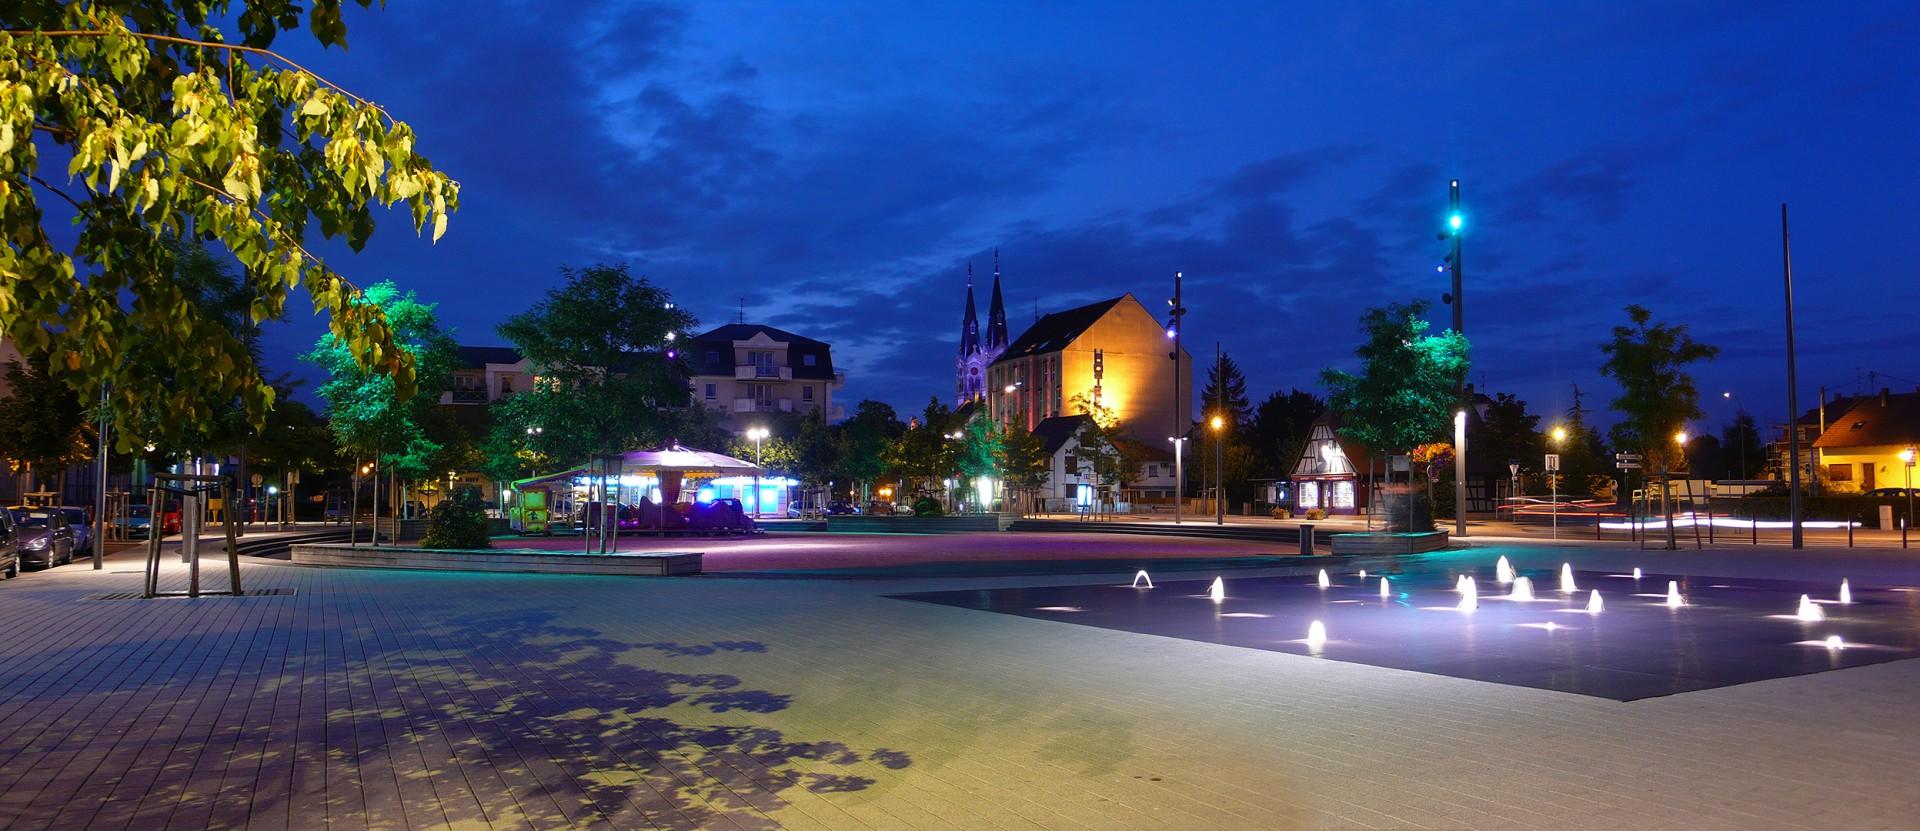 Conception-Lumiere-ActeLumiere-Illkirch-Graffenstaden-Place-Centrale-7